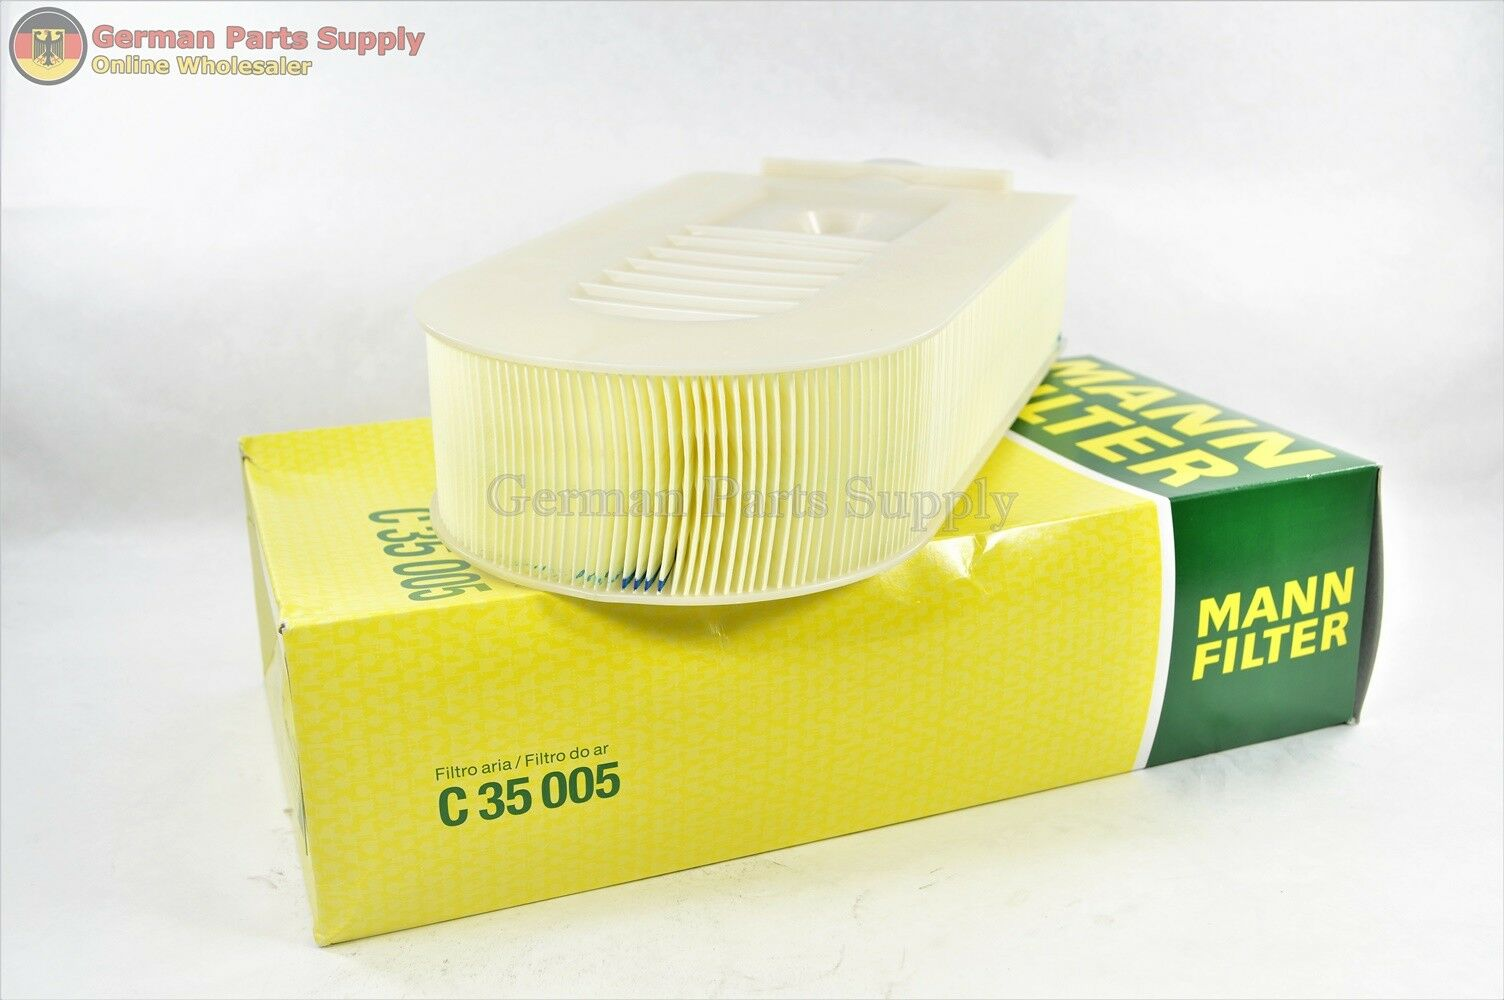 Filtro Aria Mann Filter C 35 009